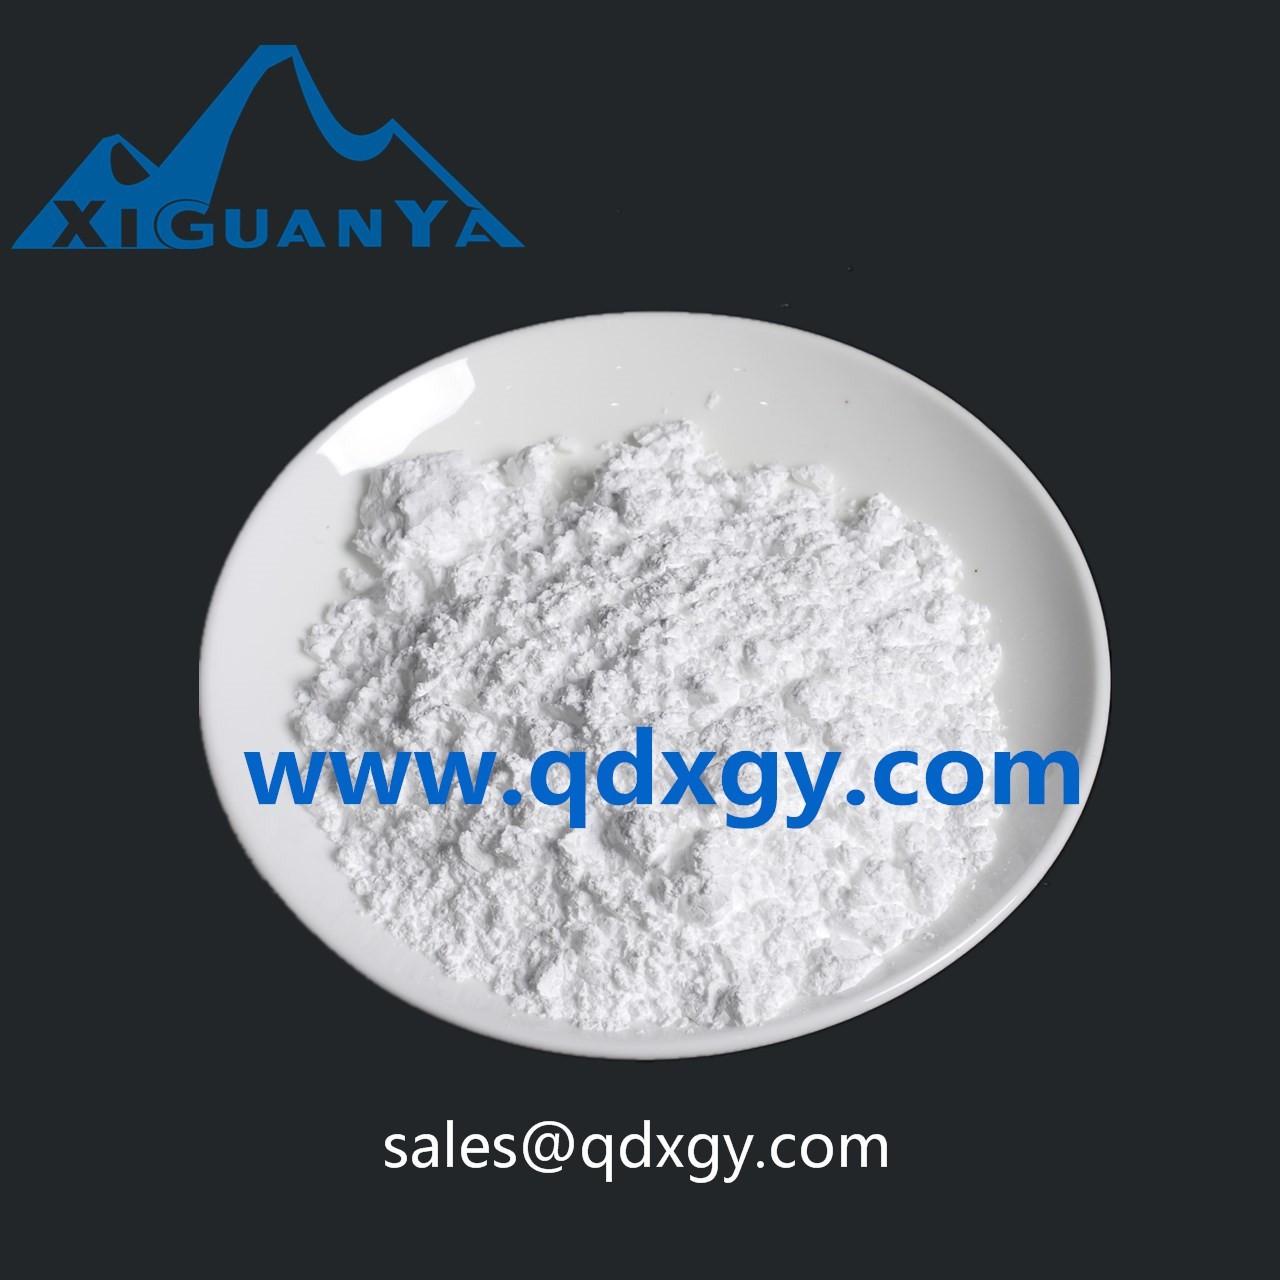 Qingdao Xiguanya Mining Industry Co.,Ltd